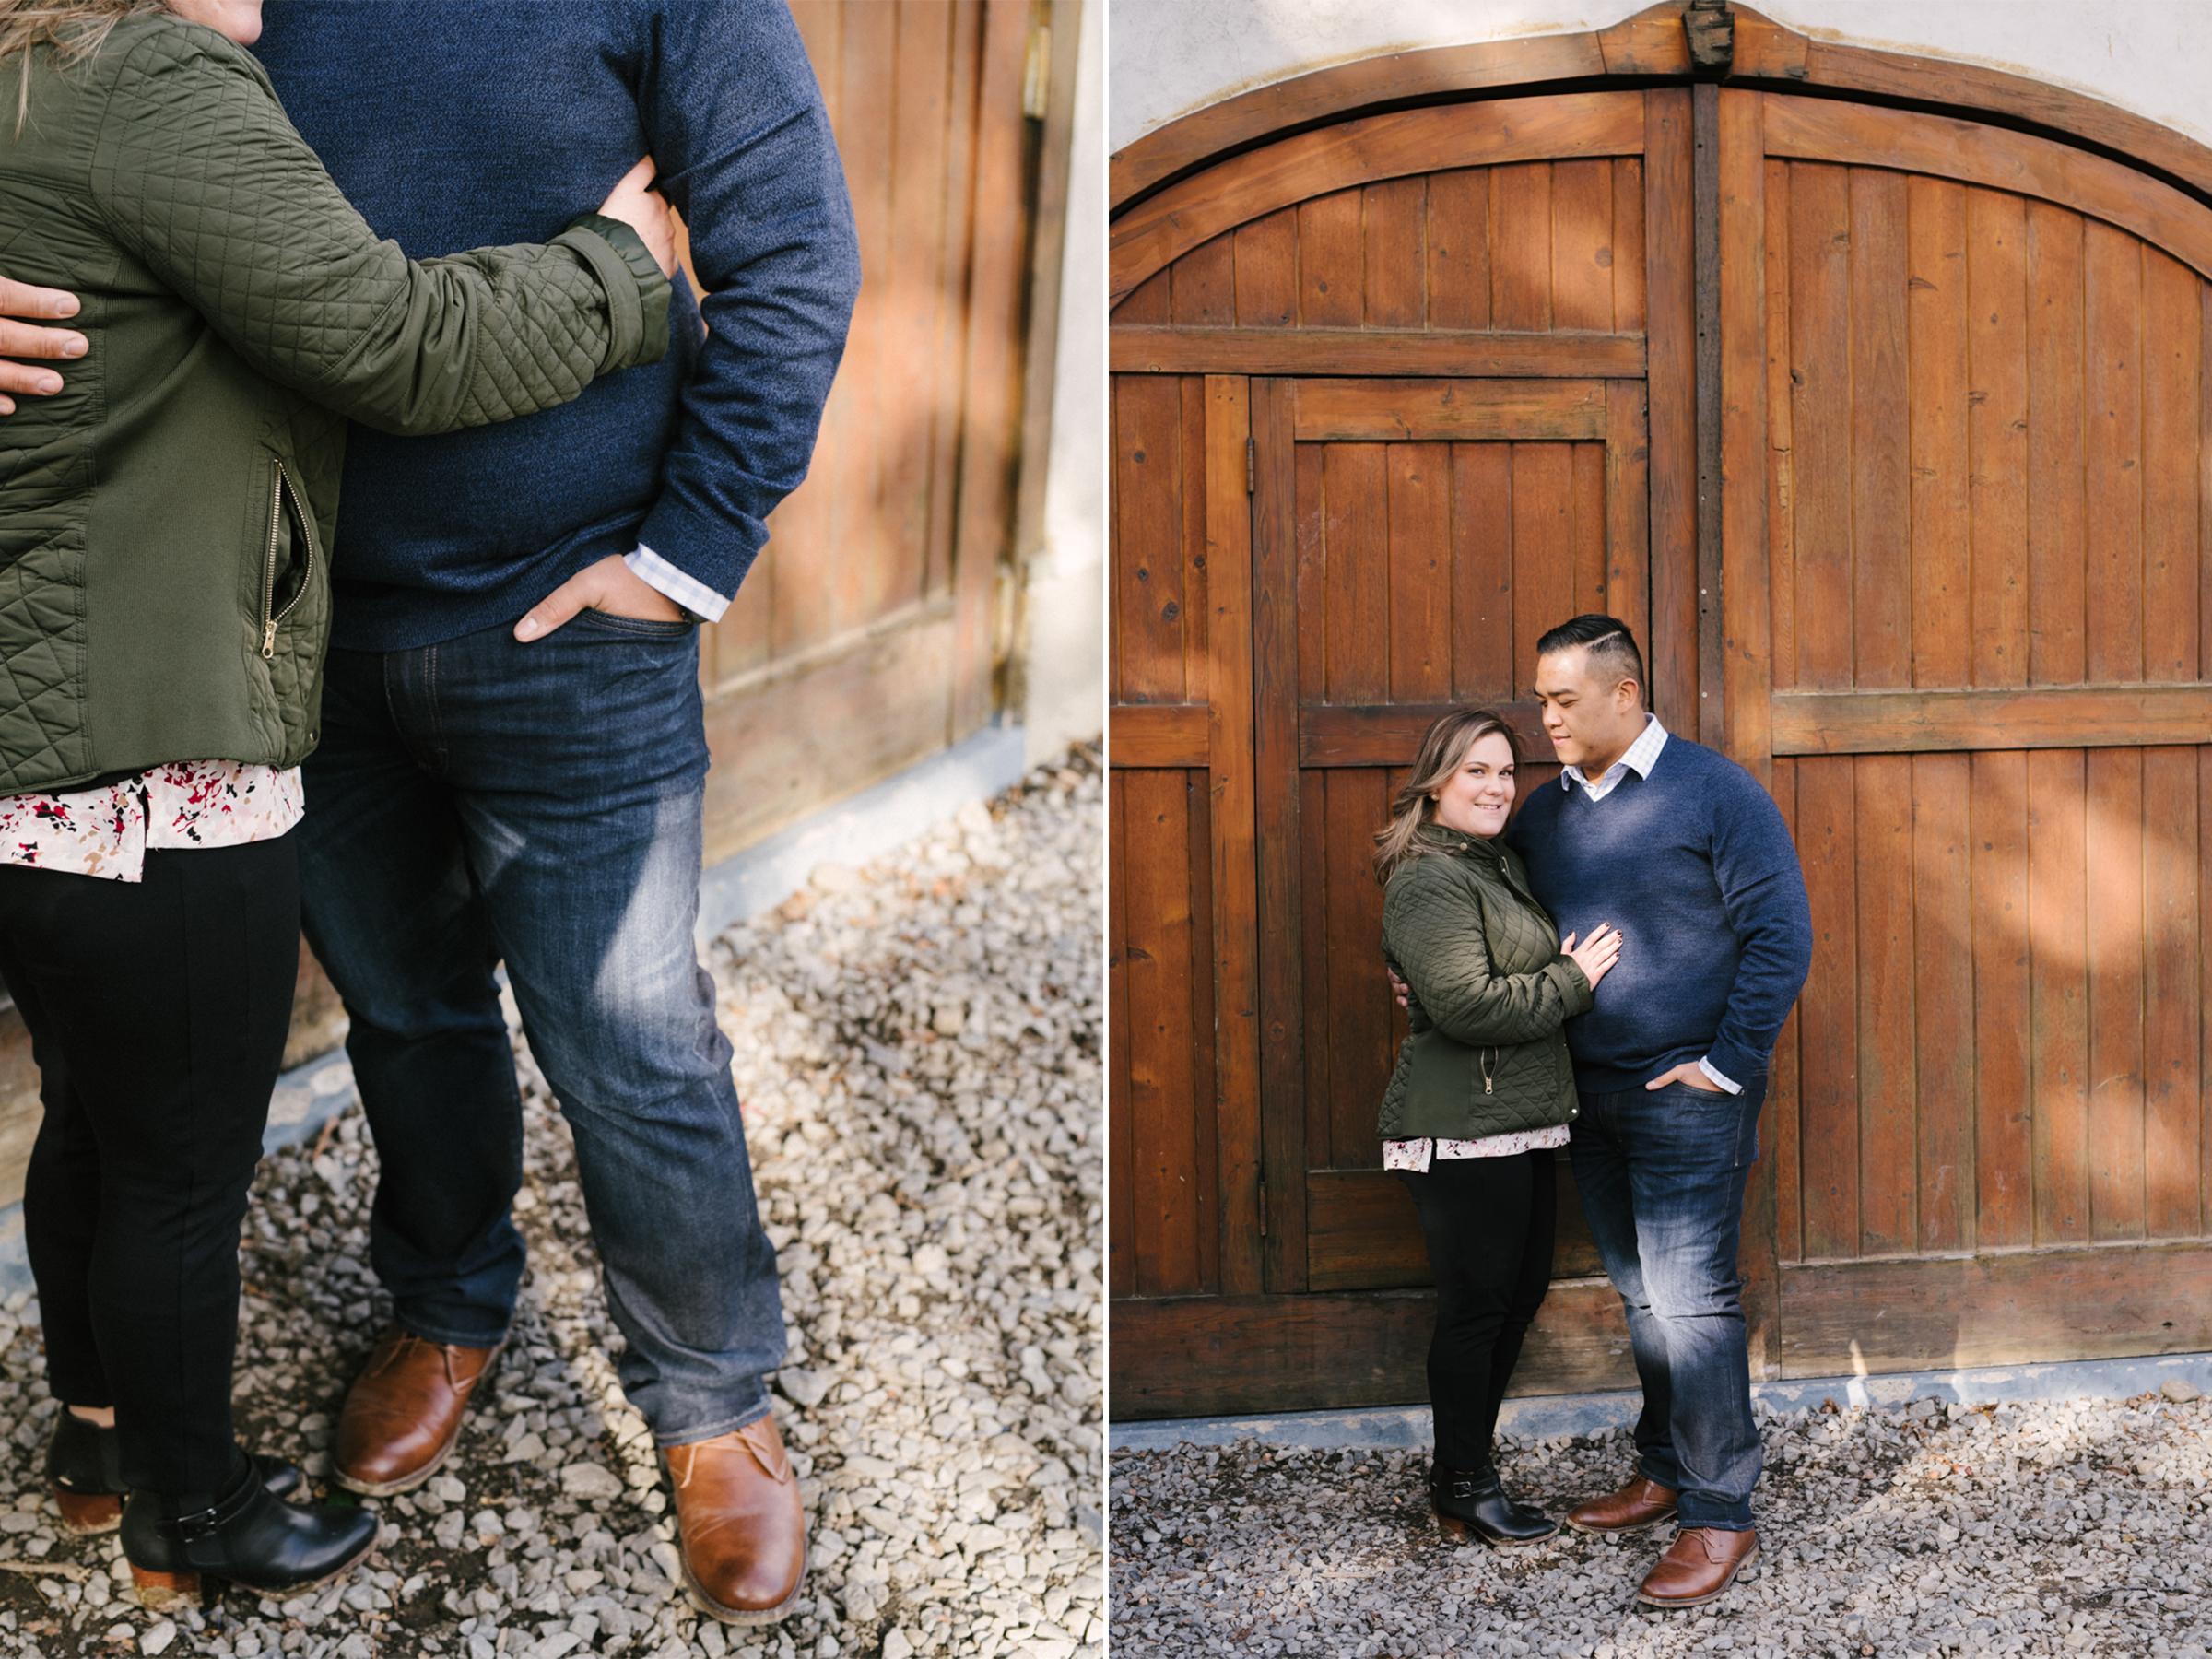 Warwick Winery Engagement Session- Diana+Jon- Fall Engagement Photos- New York- Olivia Christina Photo-Web3.jpg